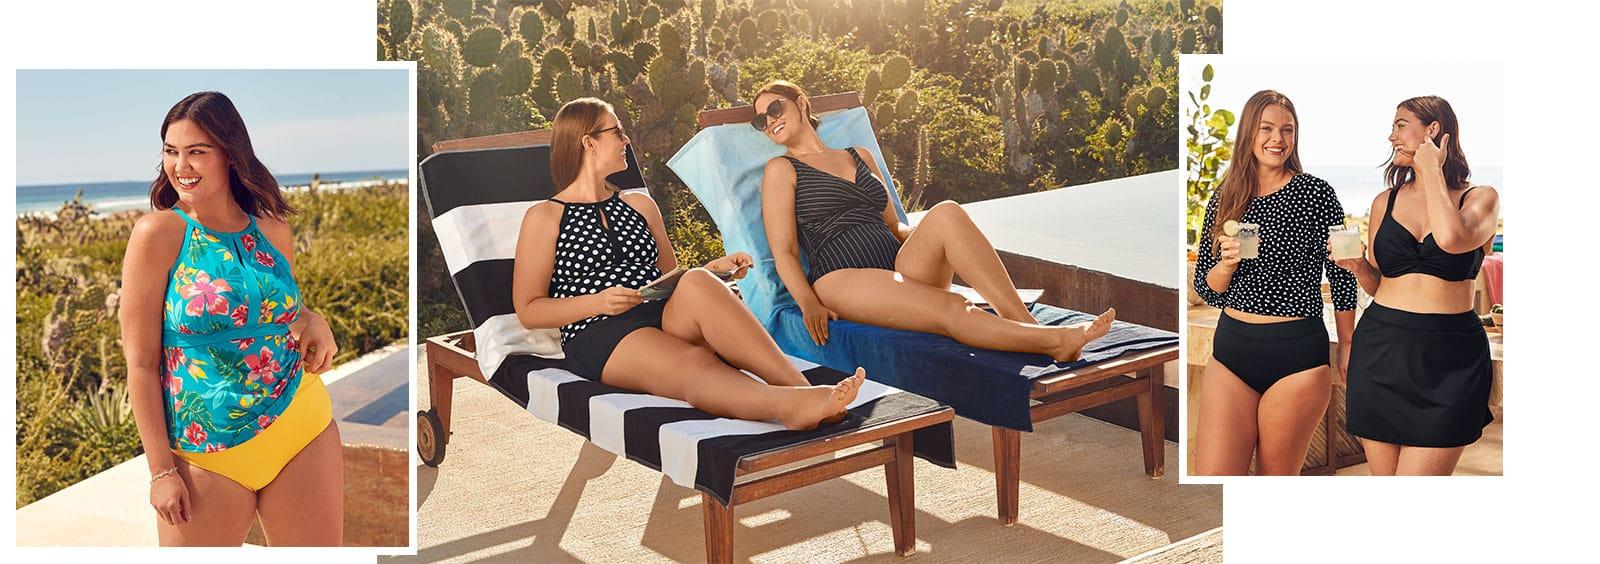 A Guide to Choosing Plus-Size Swimwear to Flatter Anyone